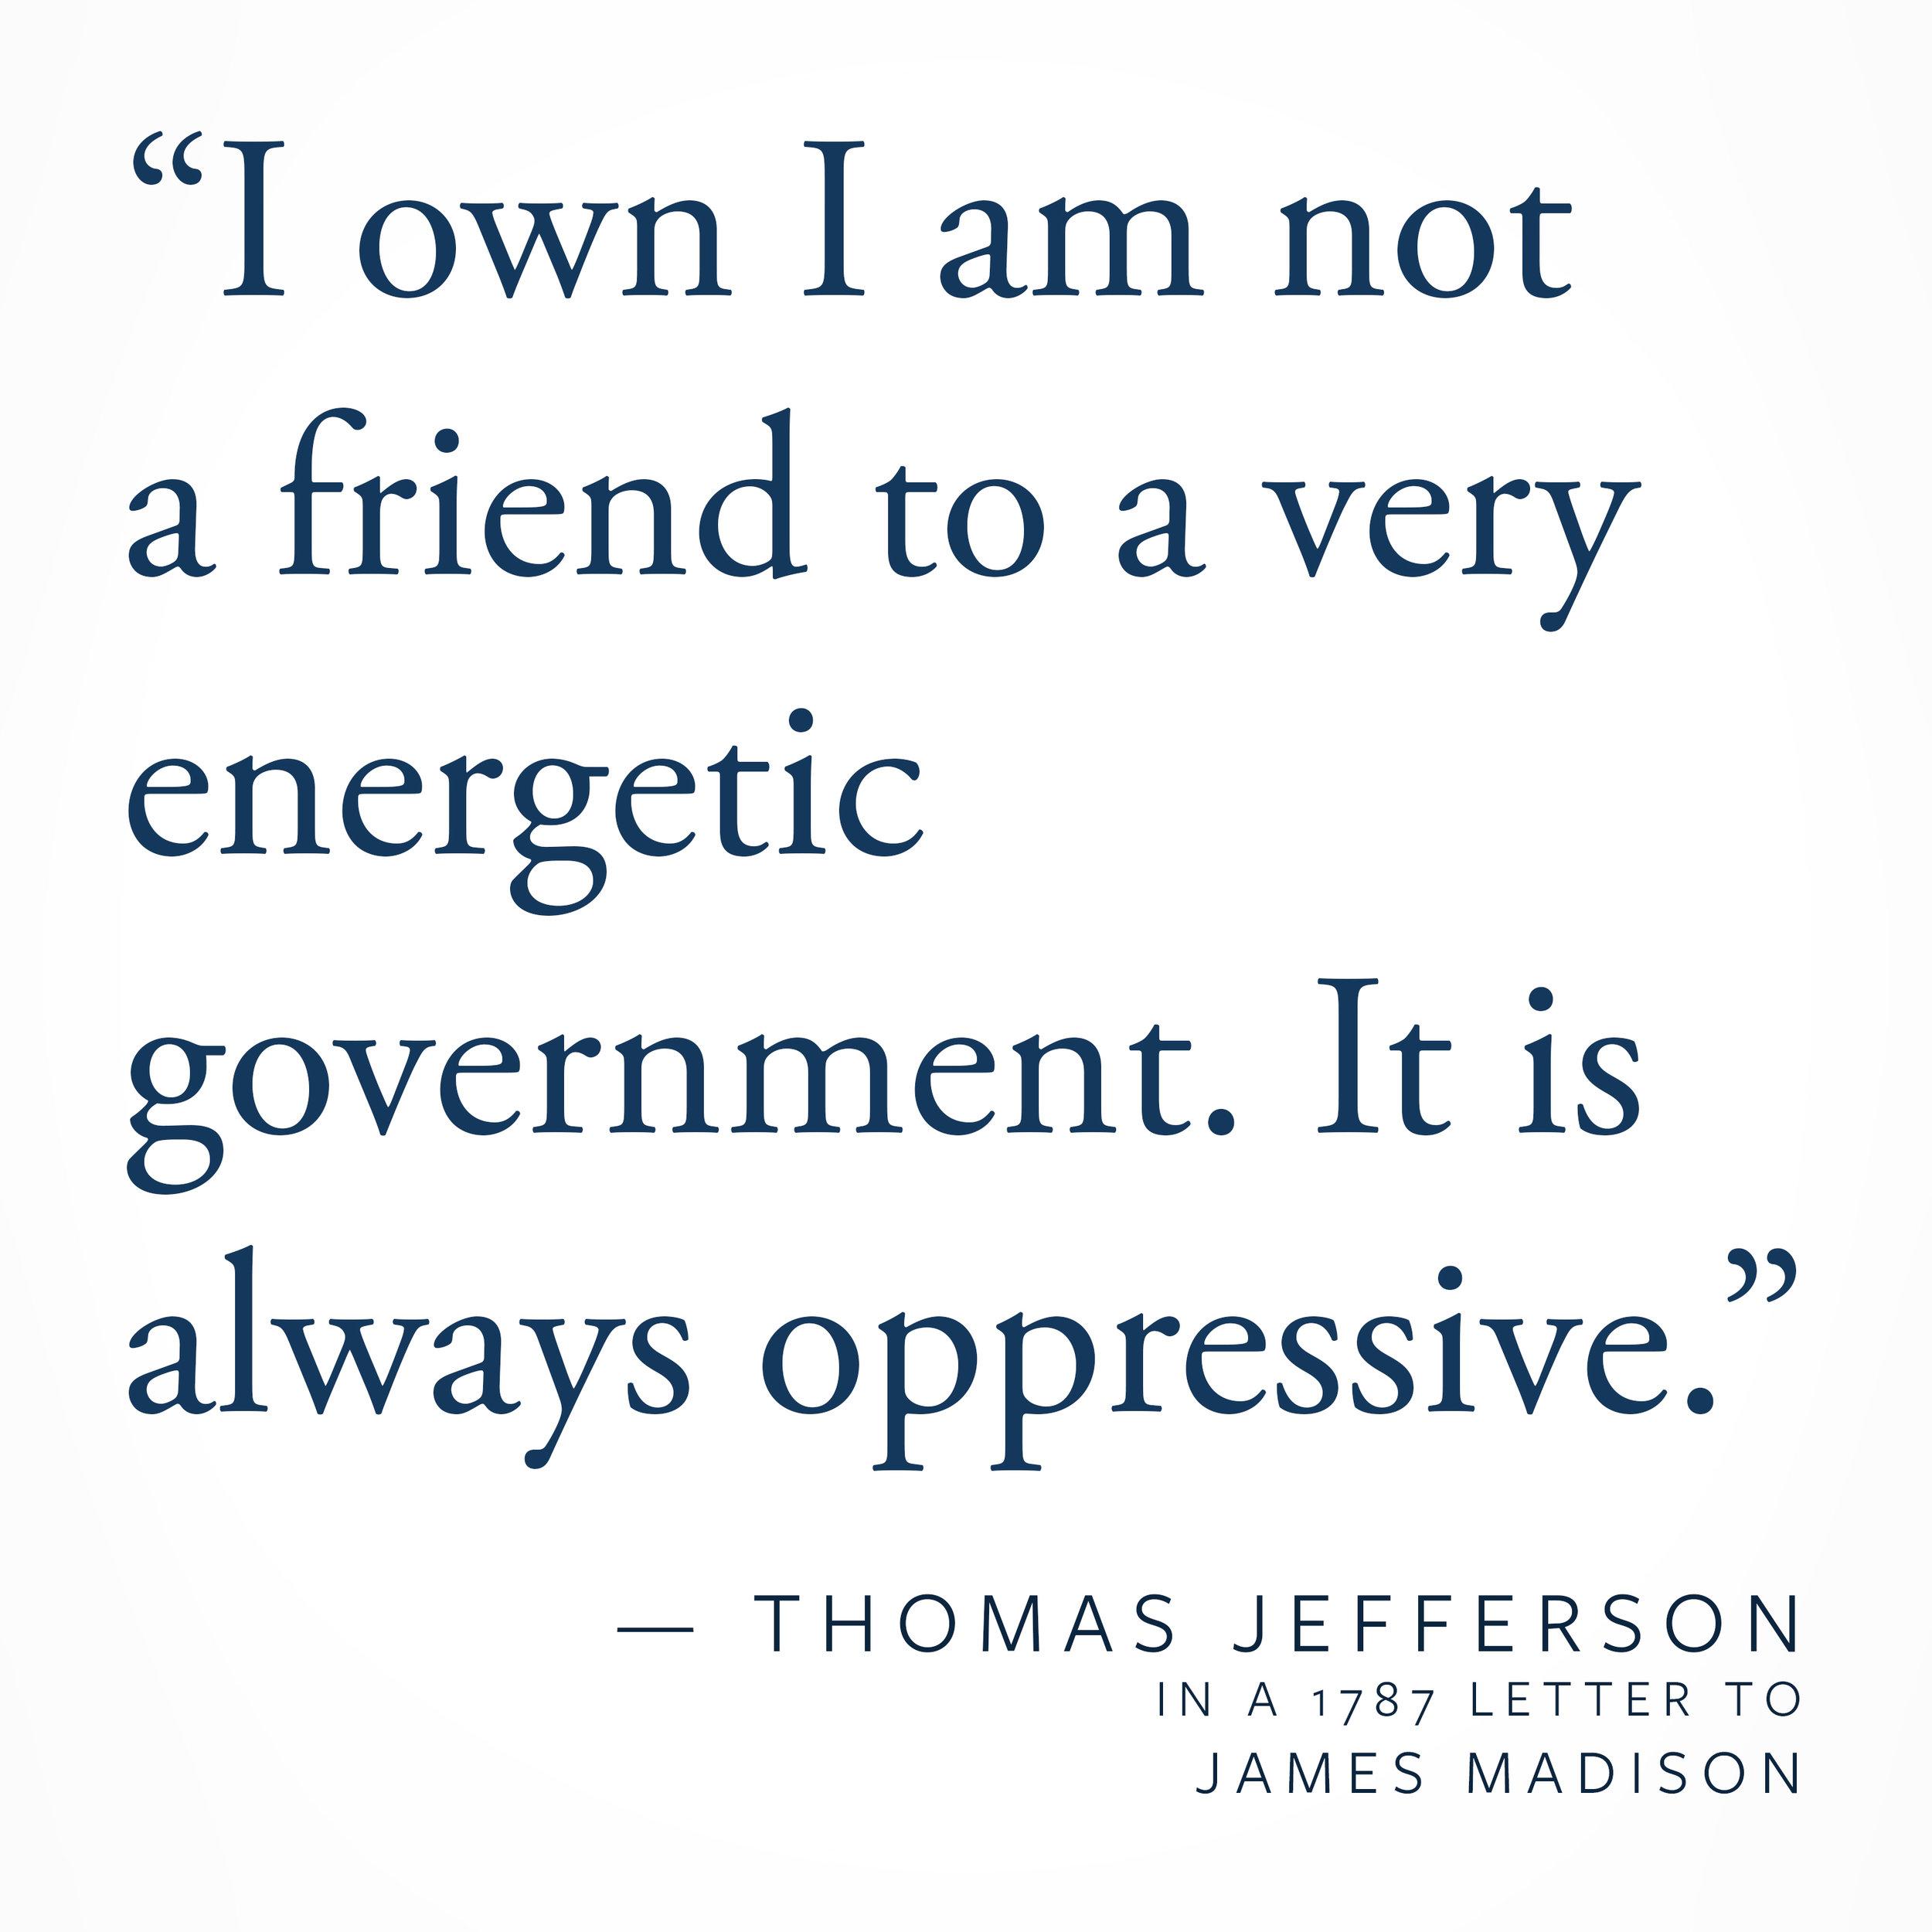 Energetic Govt